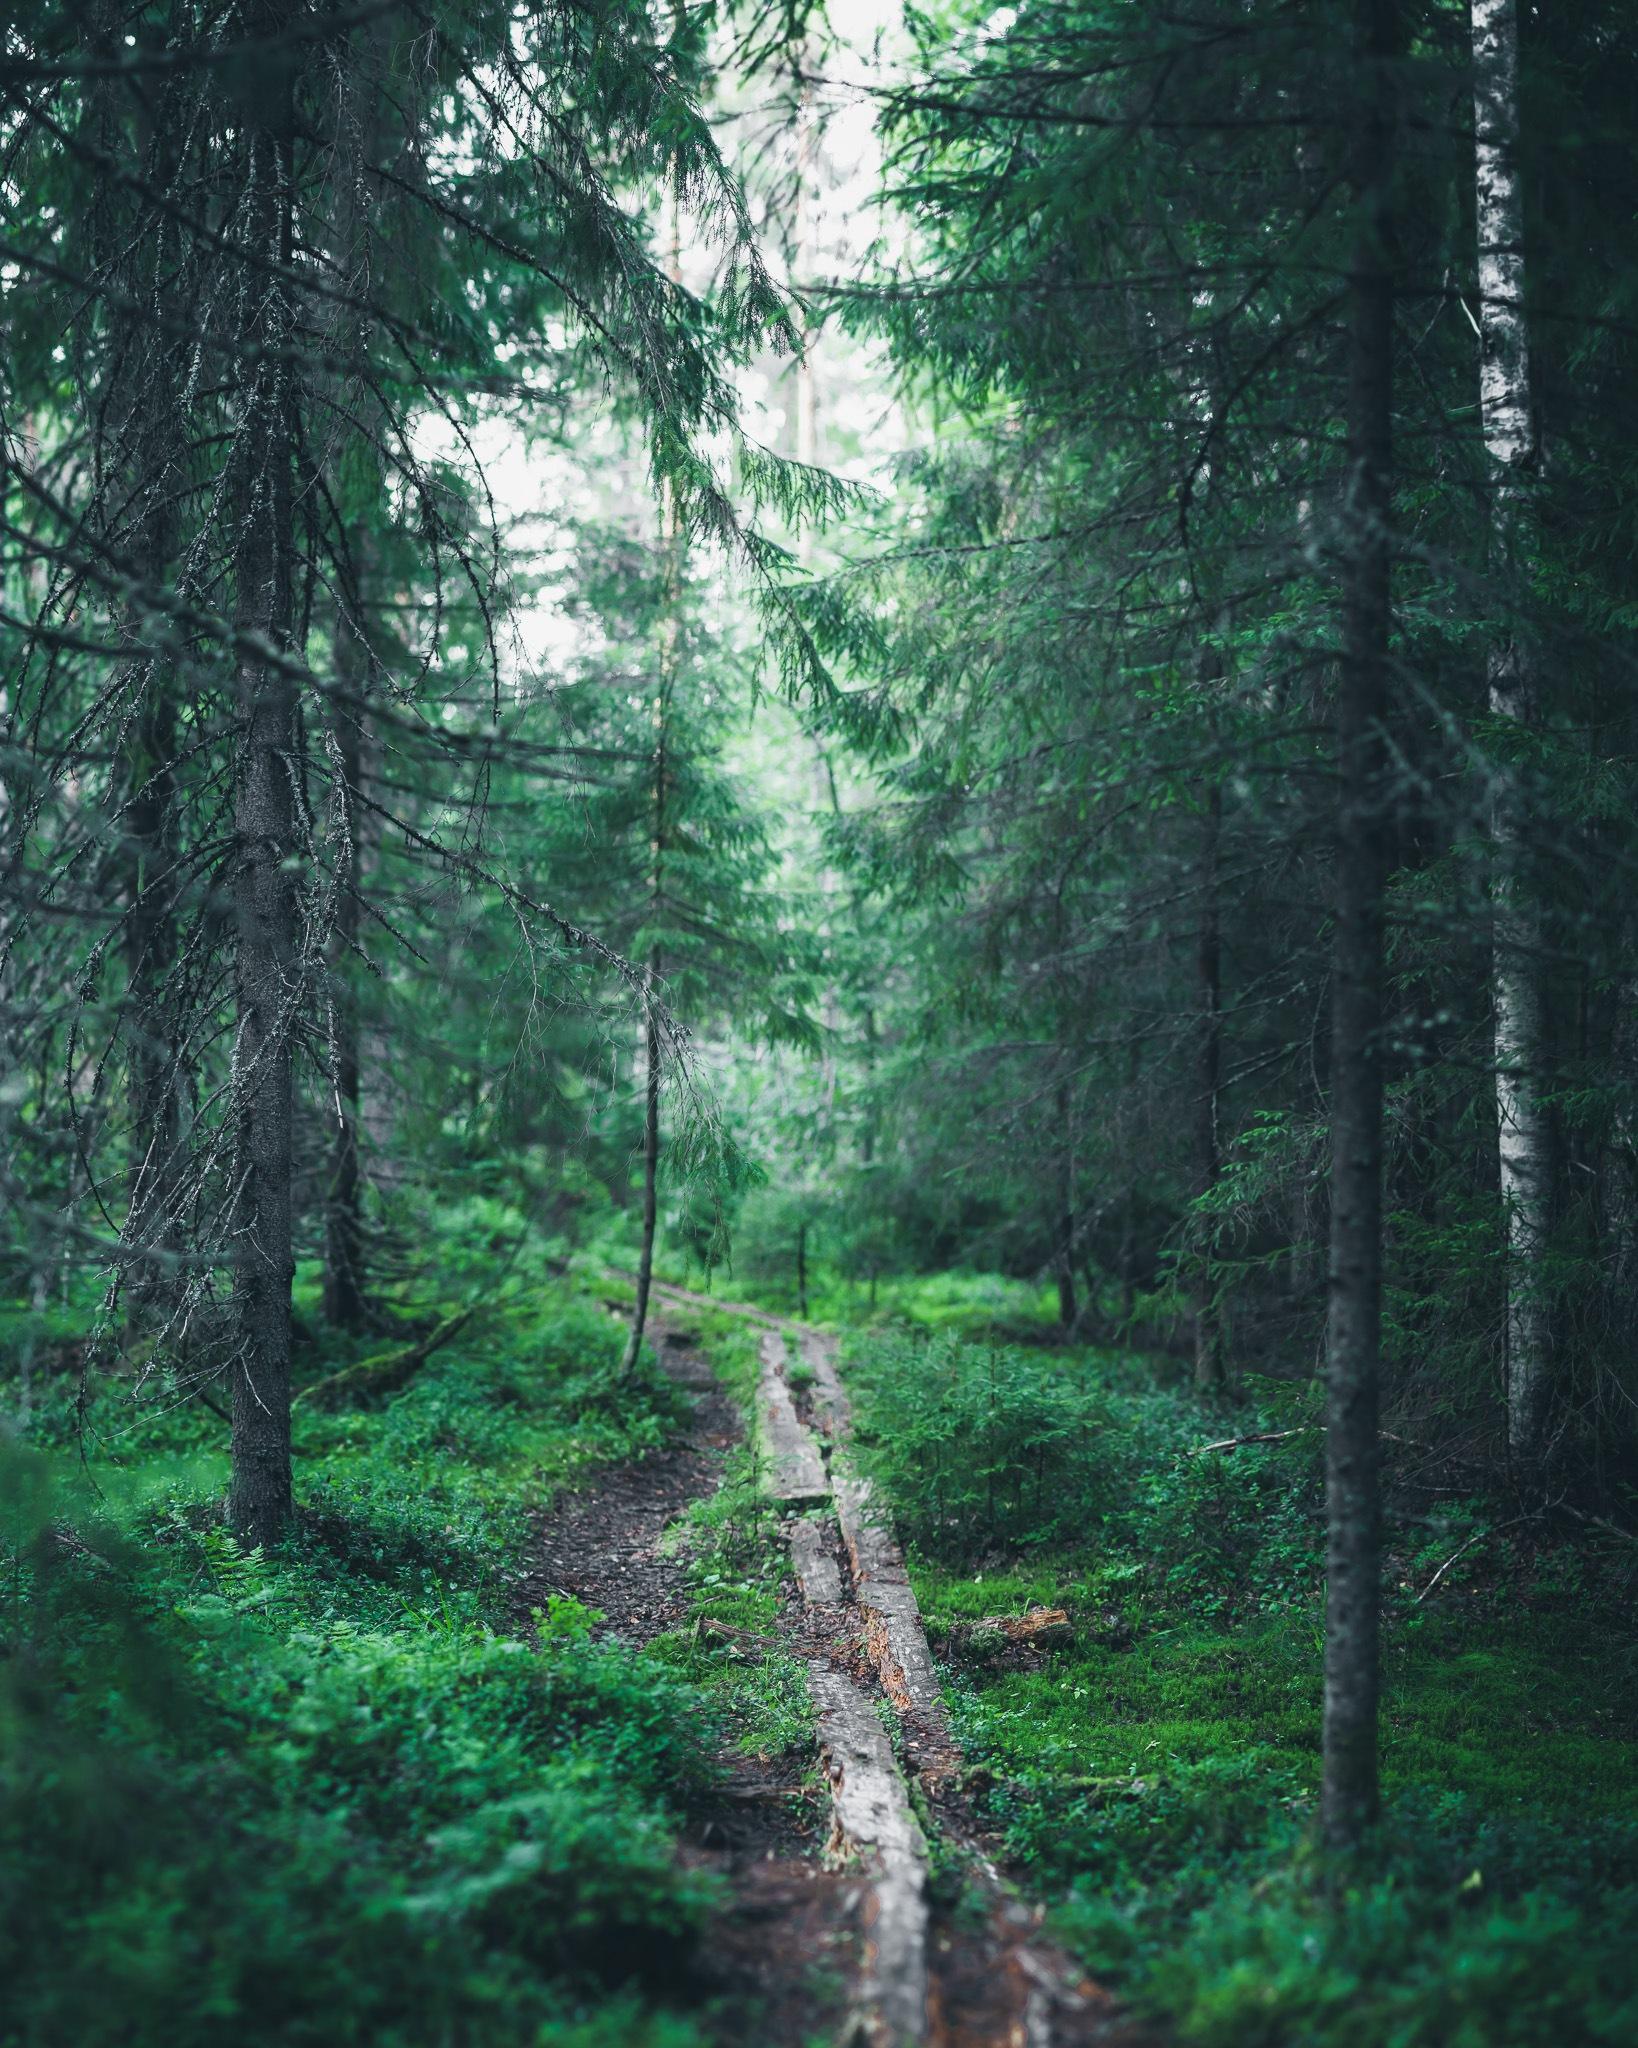 Wonders of the nature by Harri Saastamoinen